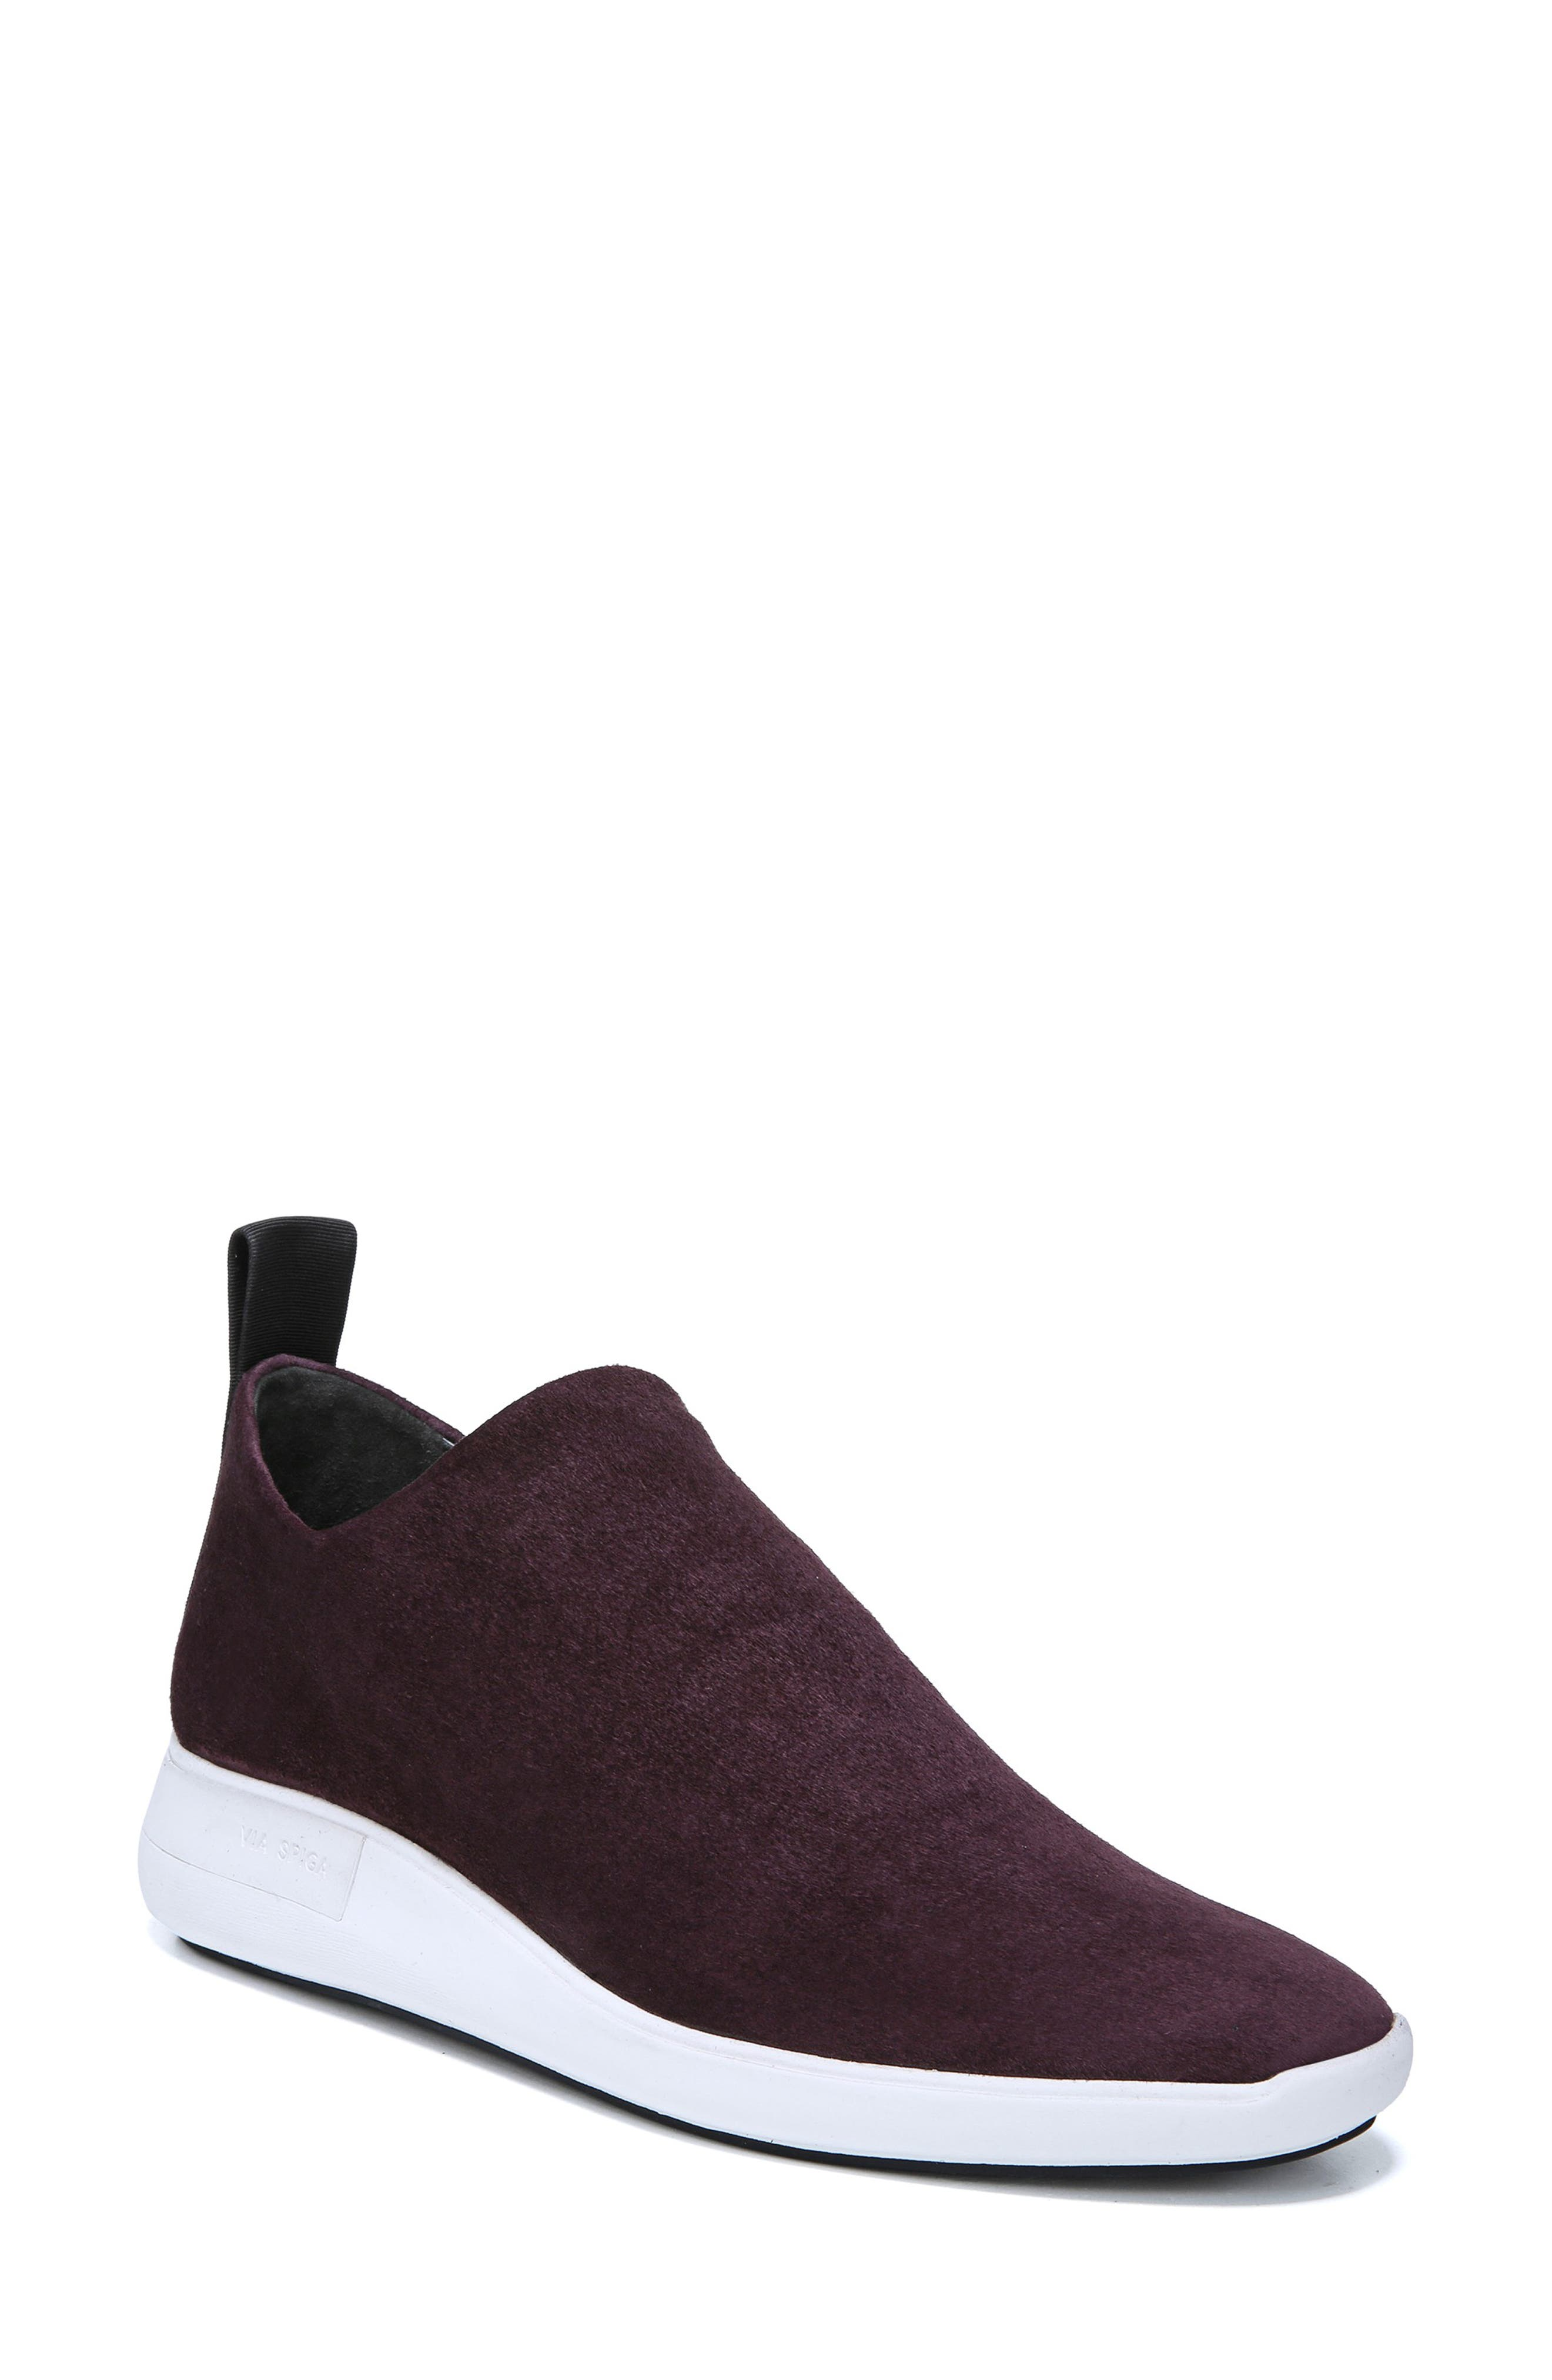 VIA SPIGA Marlow Stretch-Suede Sock Sneakers in Port